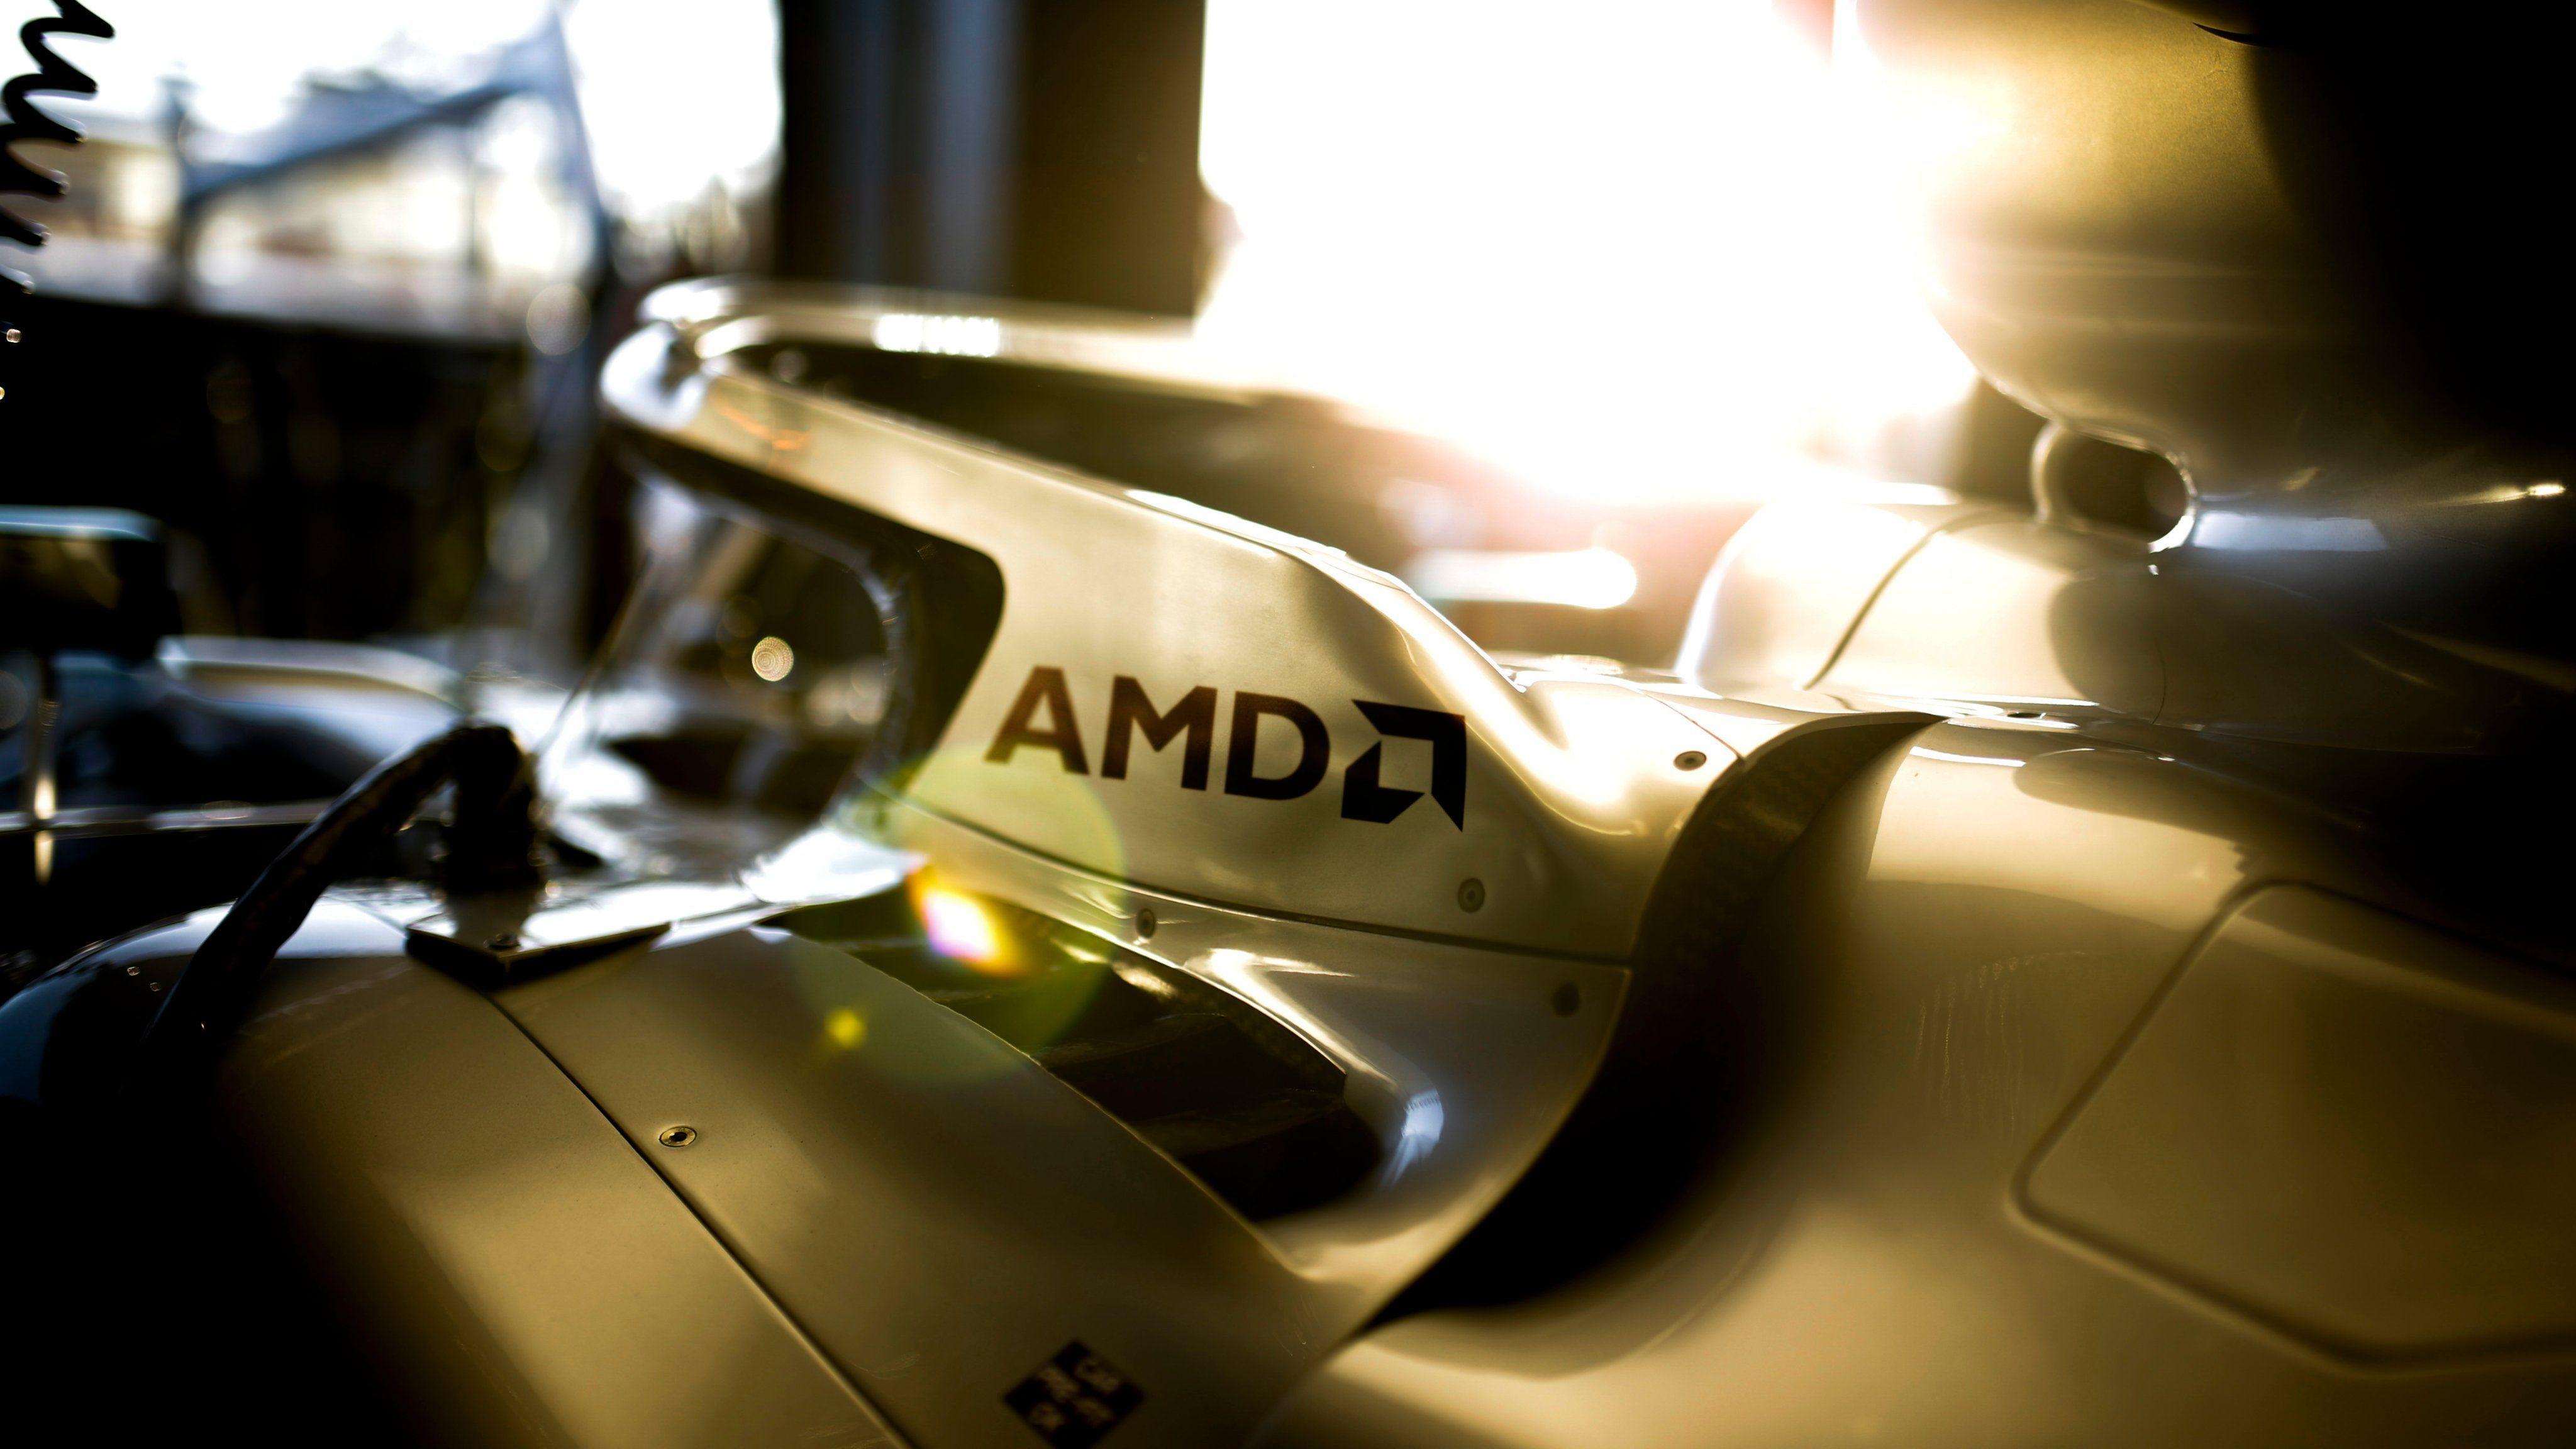 Mercedes, AMD